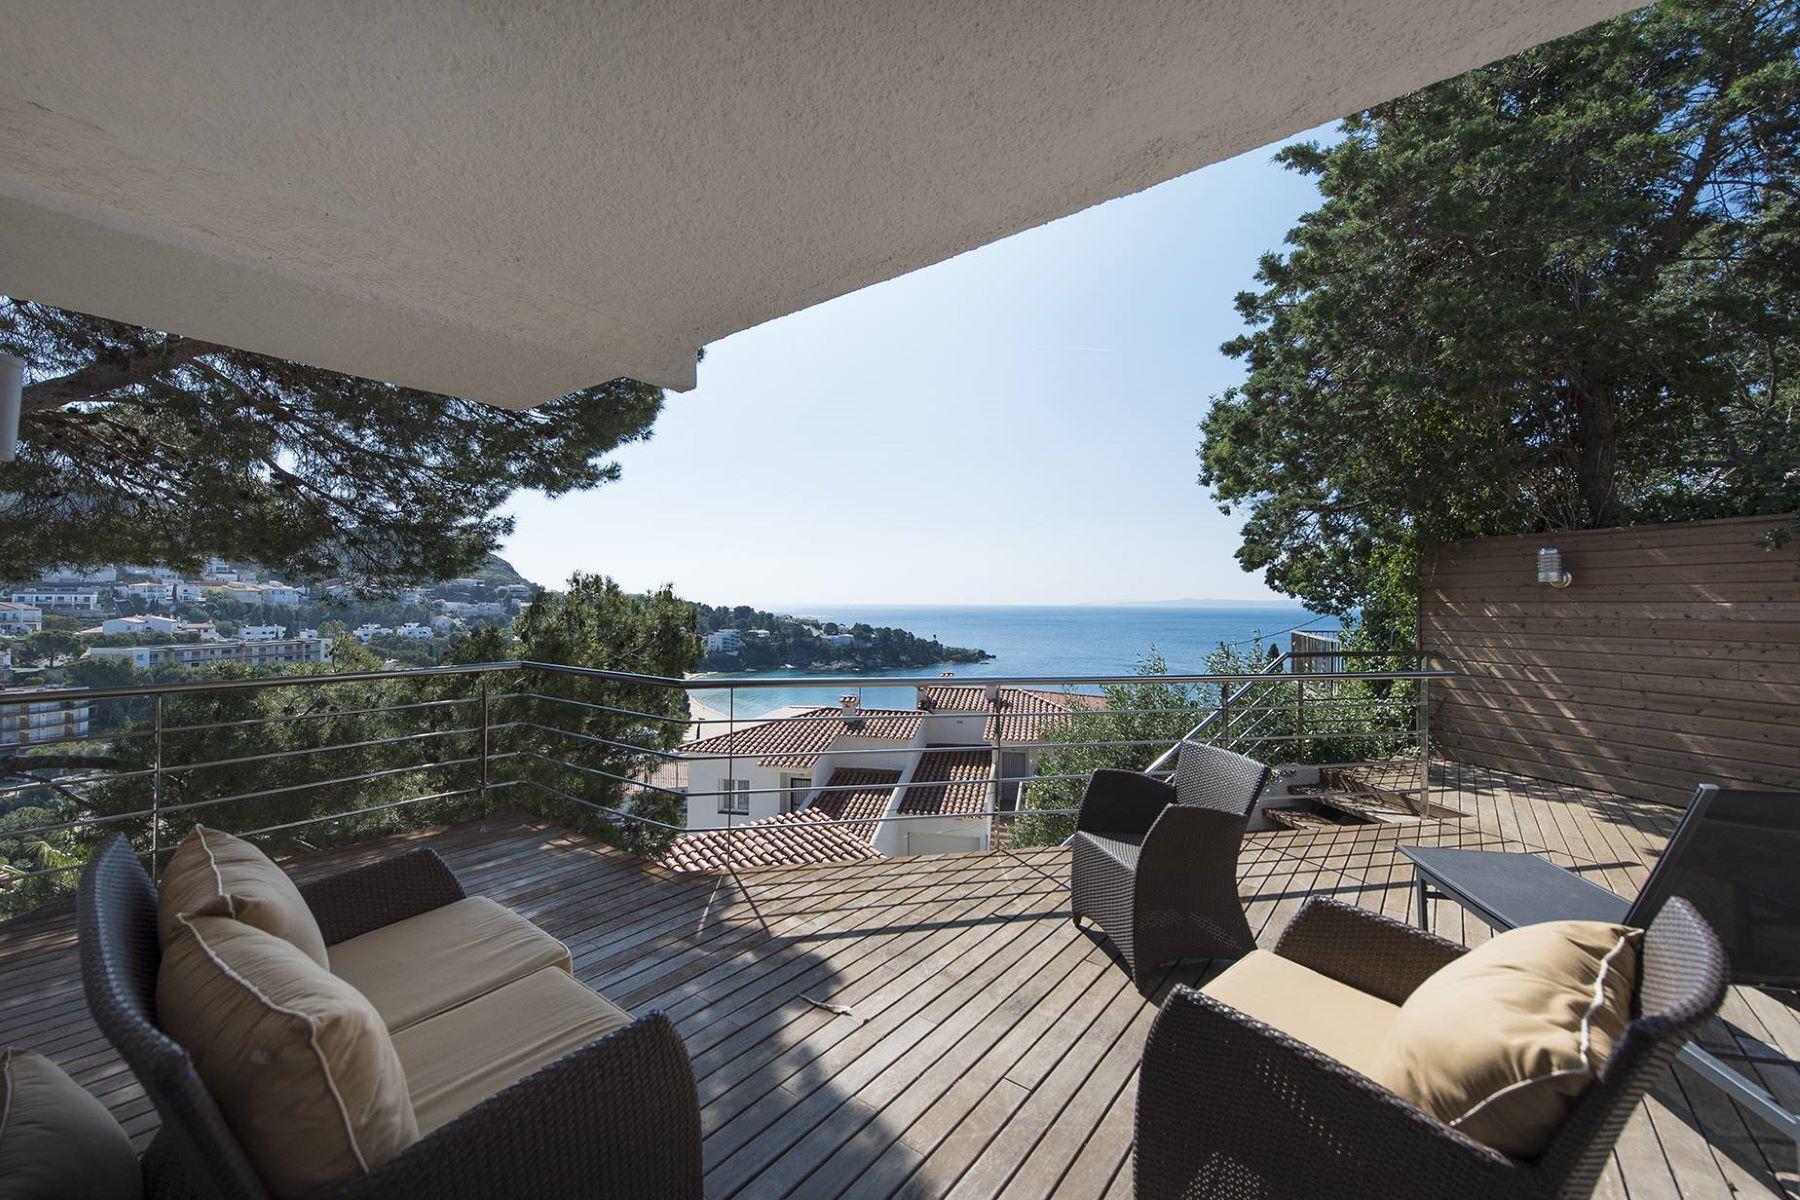 Casa Unifamiliar por un Venta en Pleasant property near Almadrava beach, sea view Roses. Roses, Costa Brava, 17480 España